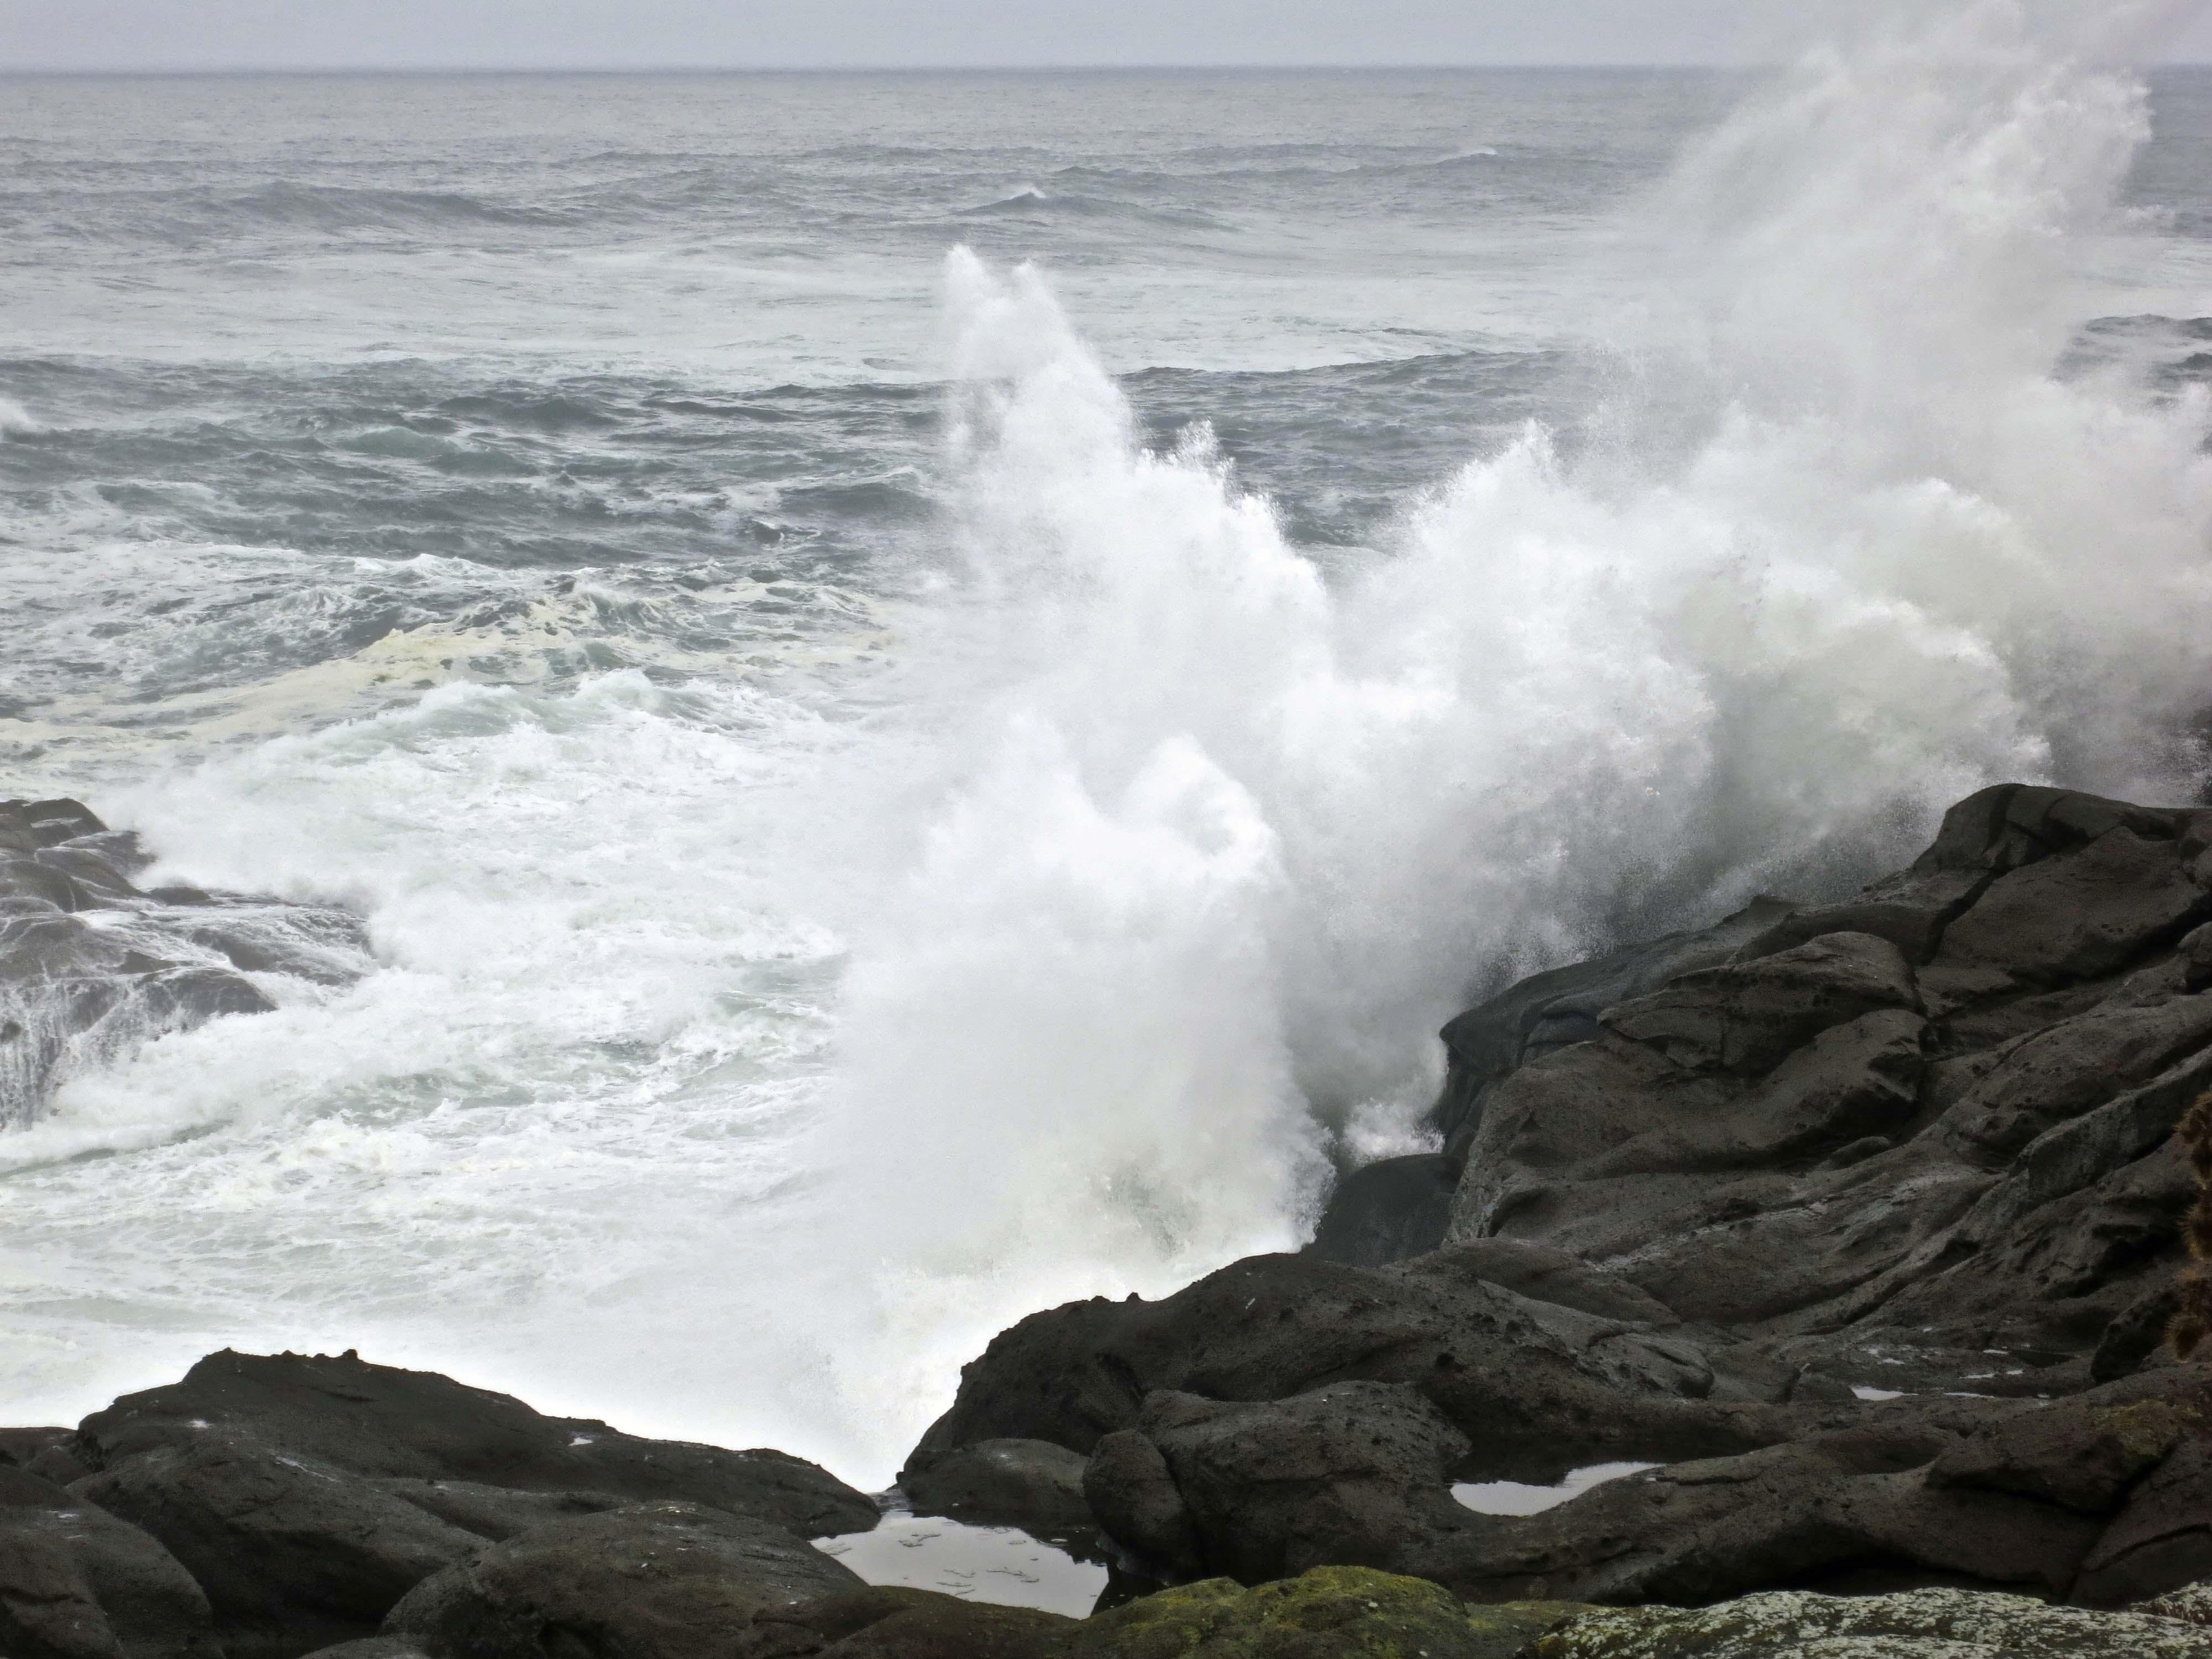 A Wild Ocean And Crashing Waves… The Oregon Coast